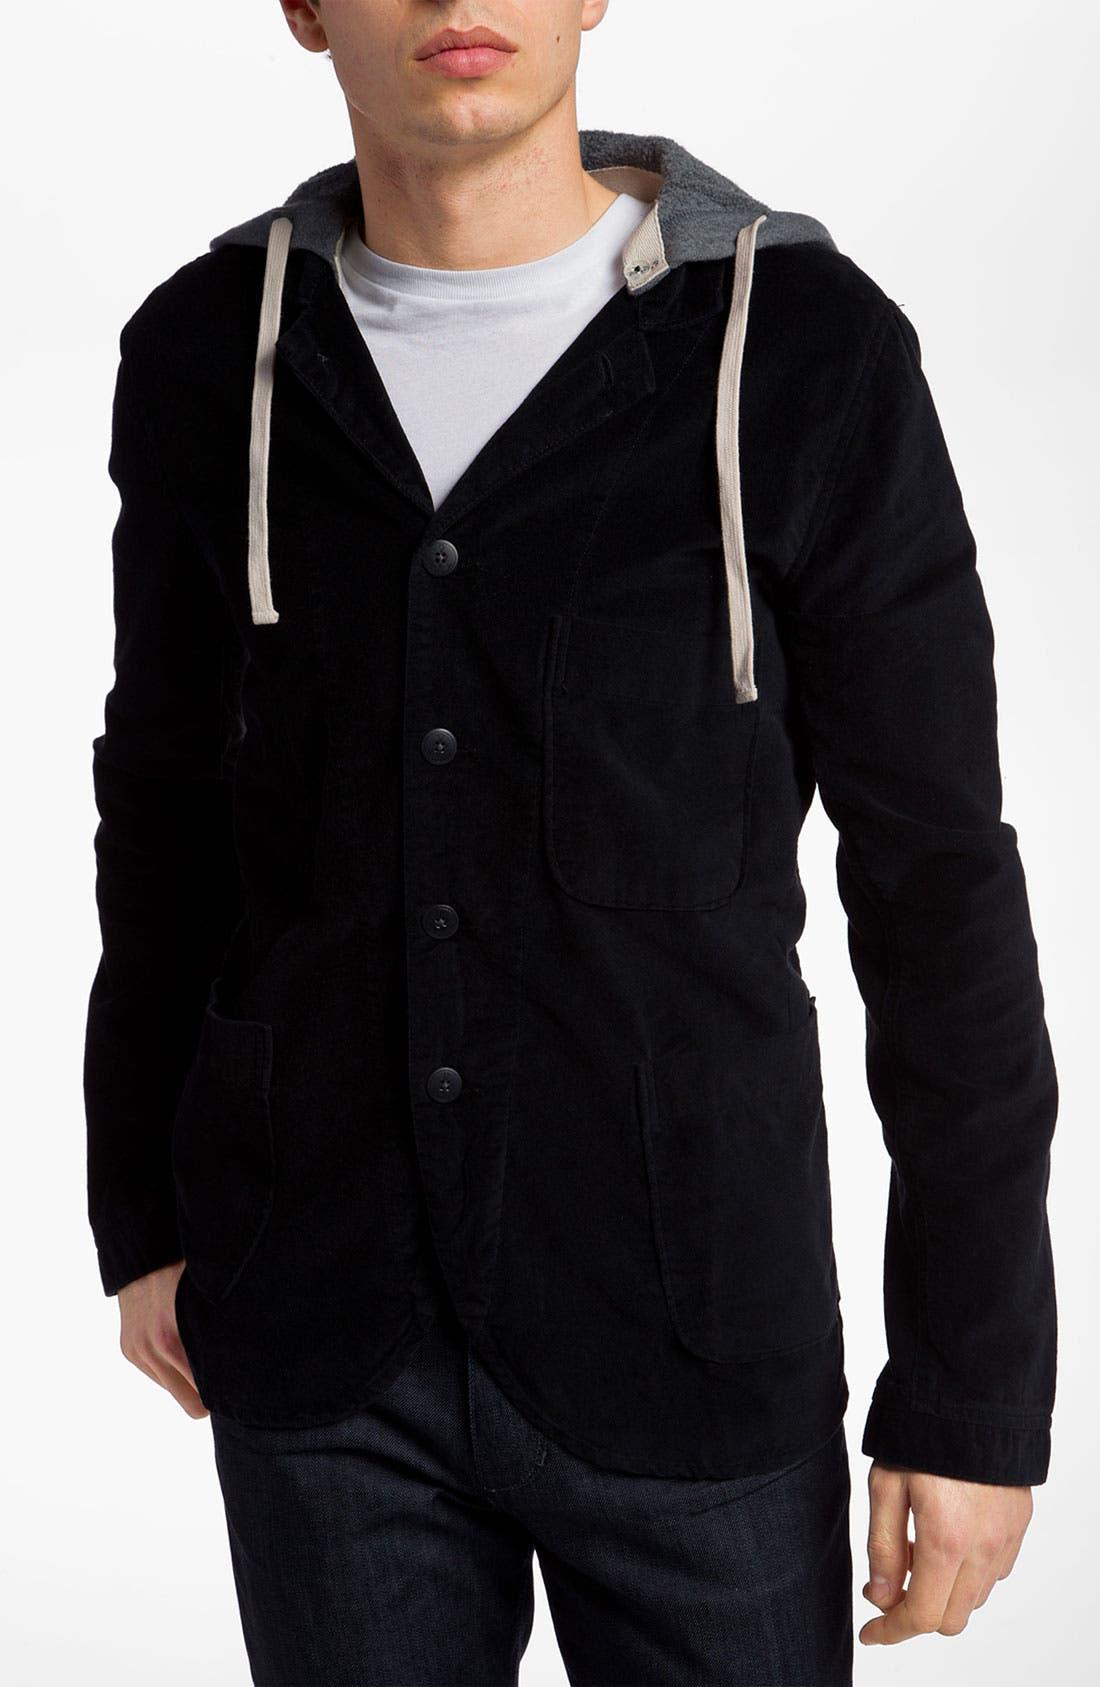 Main Image - Alternative 'Bridgeport' Hooded Blazer Style Jacket